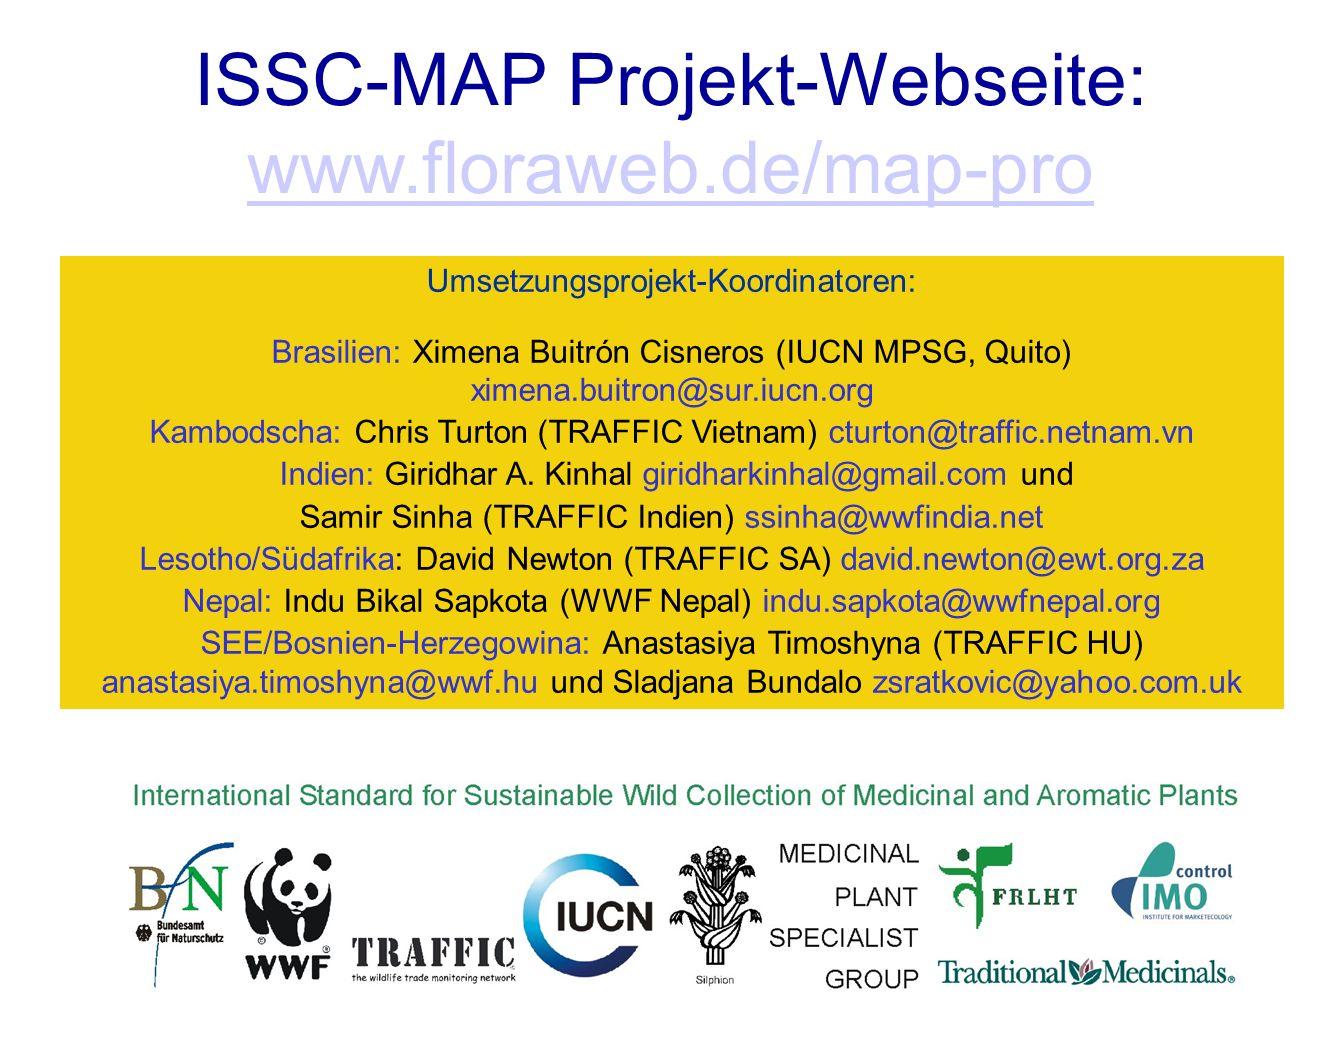 Umsetzungsprojekt-Koordinatoren: Brasilien: Ximena Buitrón Cisneros (IUCN MPSG, Quito) ximena.buitron@sur.iucn.org Kambodscha: Chris Turton (TRAFFIC V